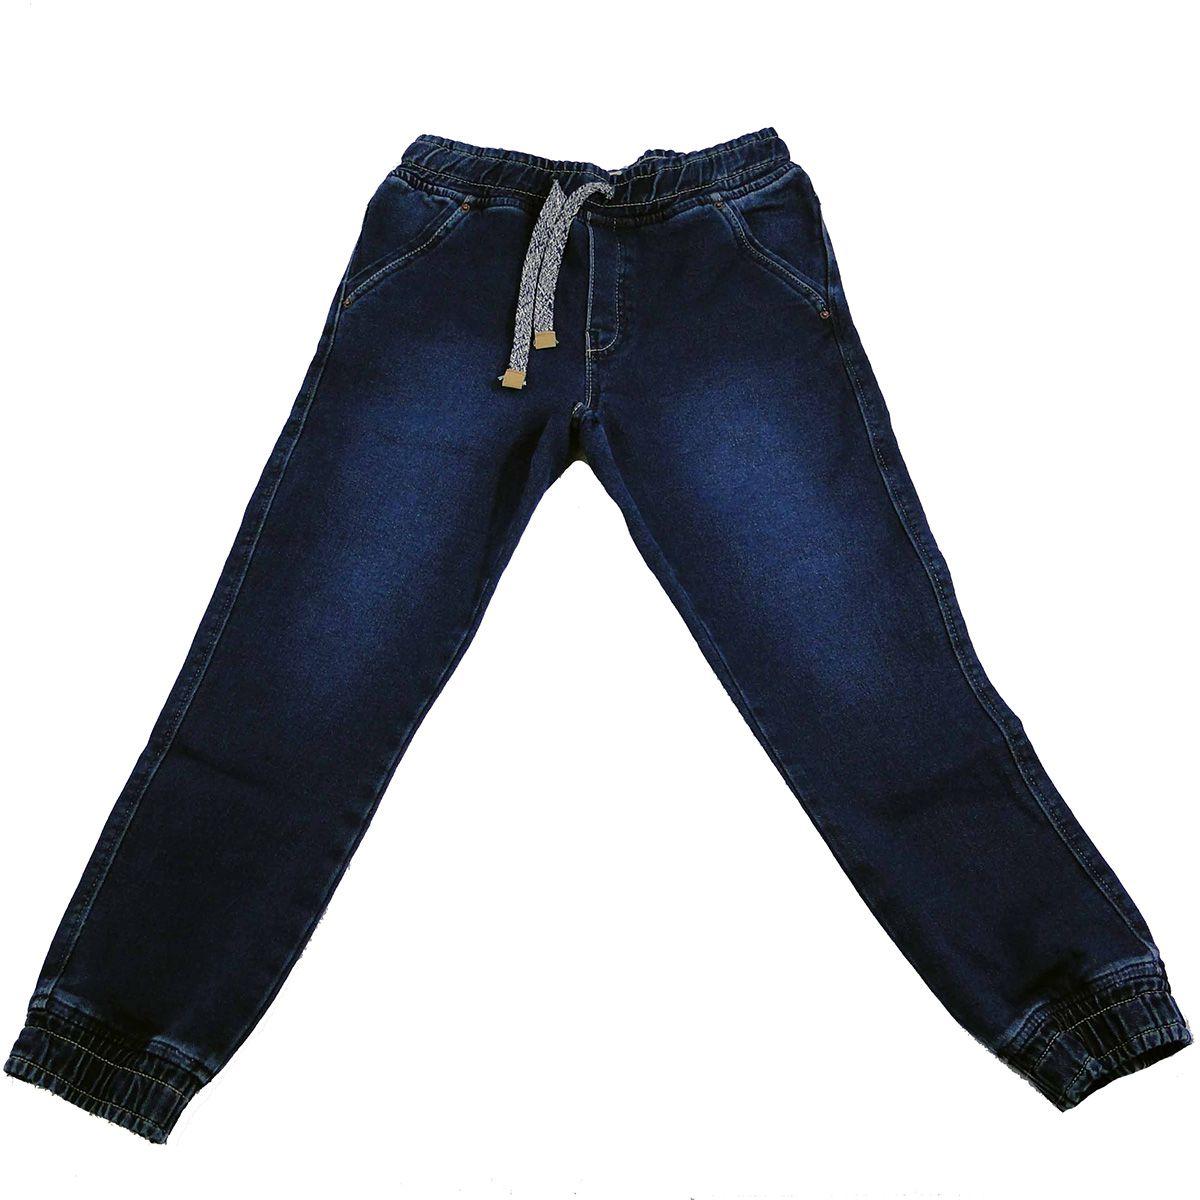 Calça Banana Danger Masculina Jeans Jogger